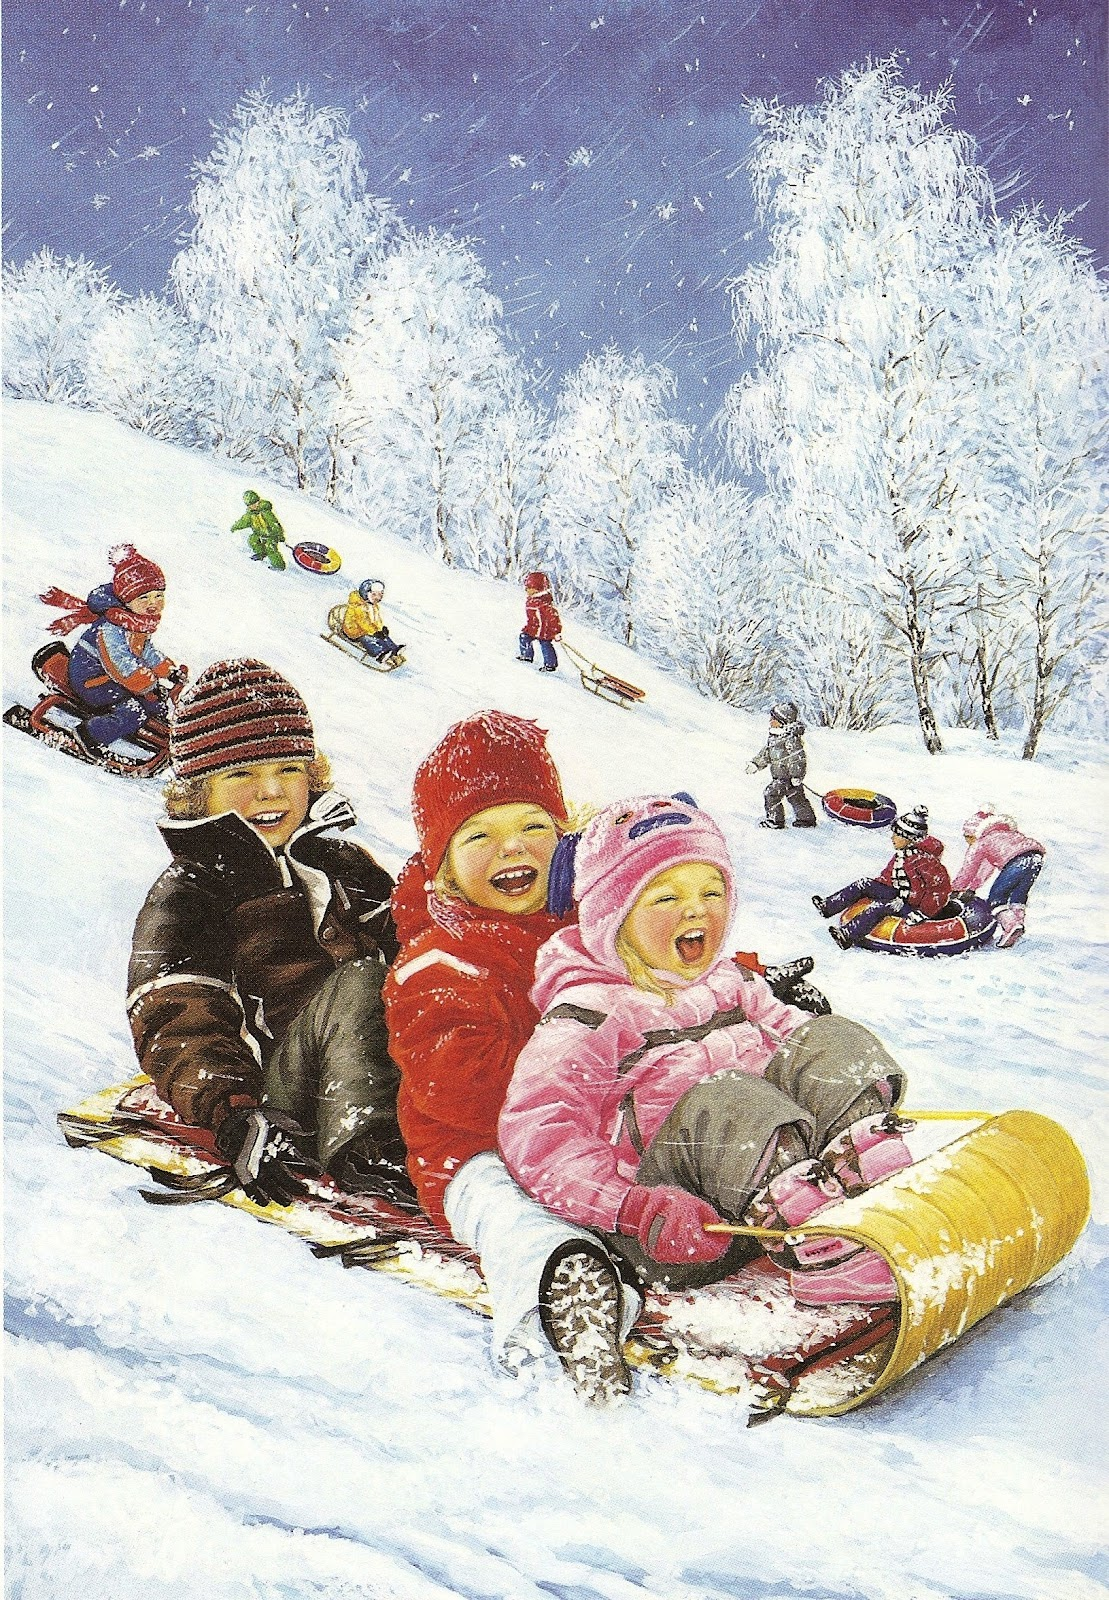 Зима дети зимние забавы времена года